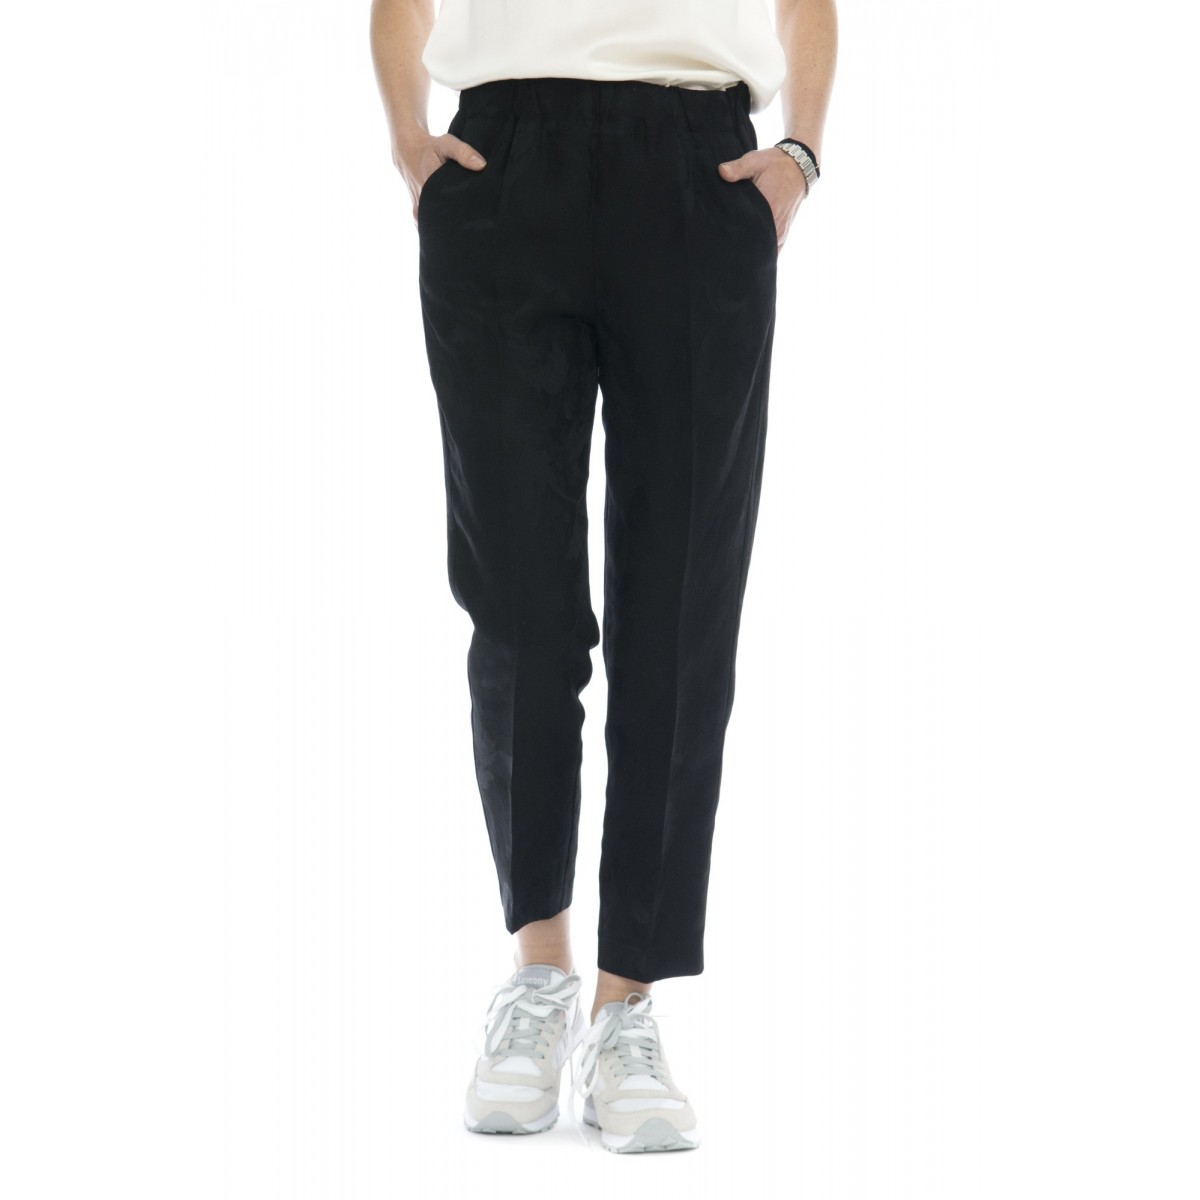 Pantalone donna - 4001 pantalone damascato elastico